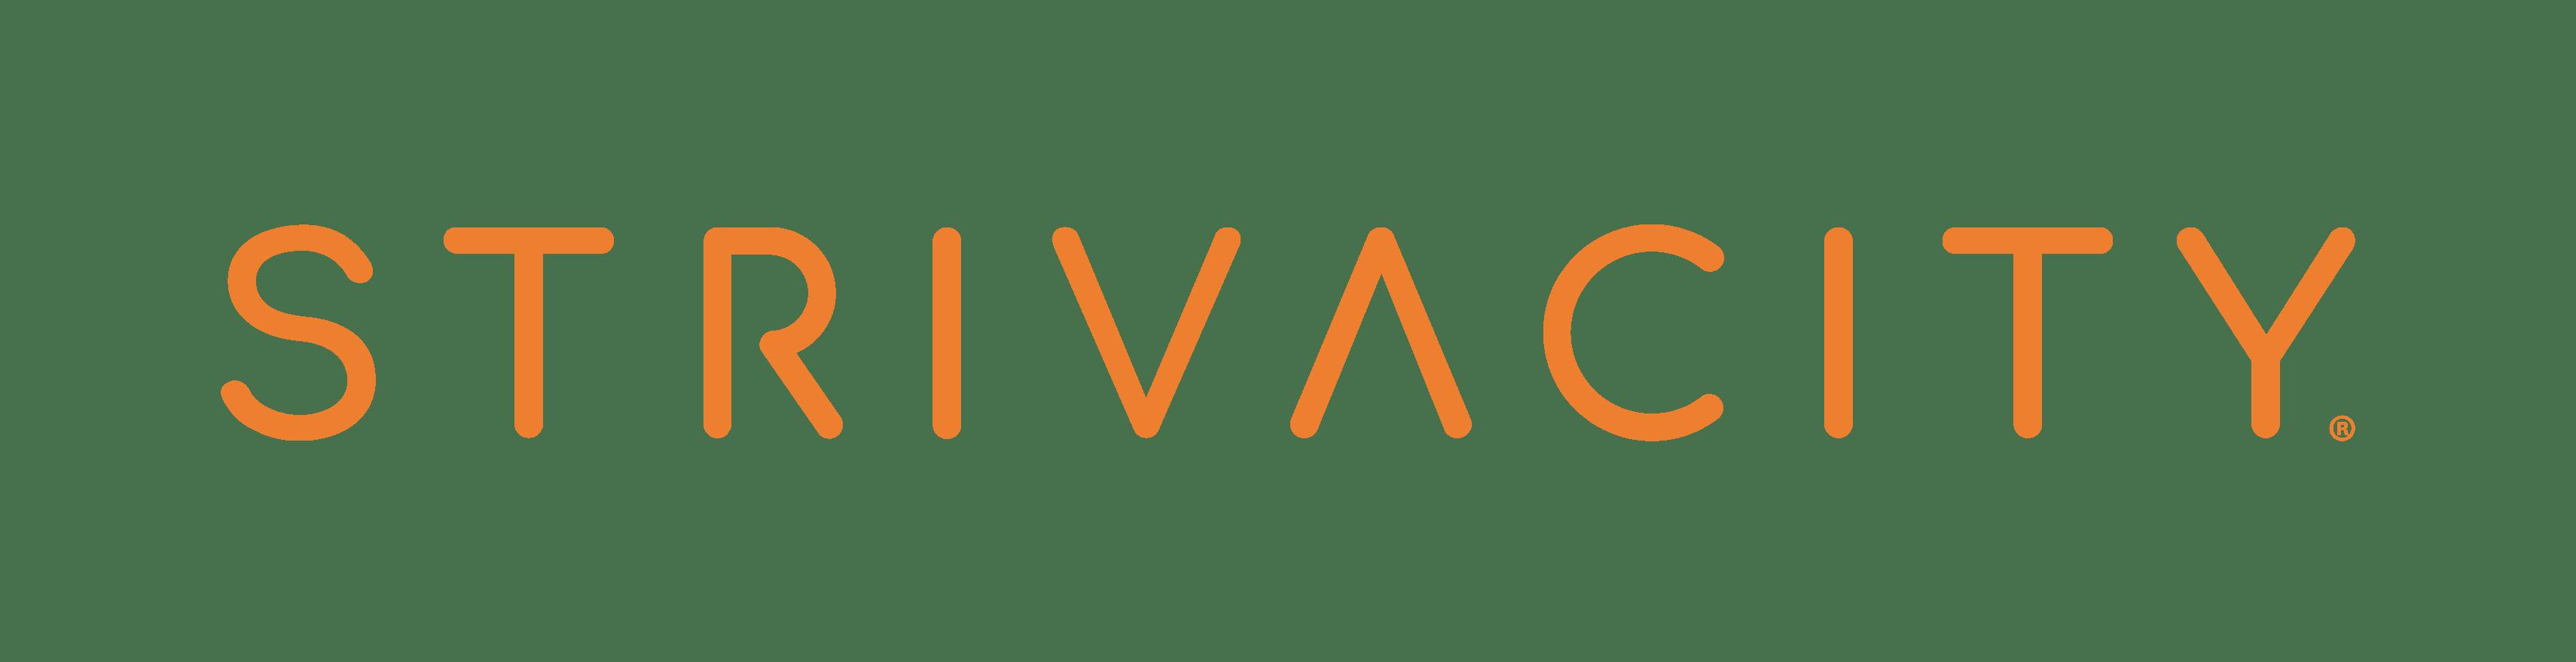 Strivacity_LT-Orange_Trnsbg-2